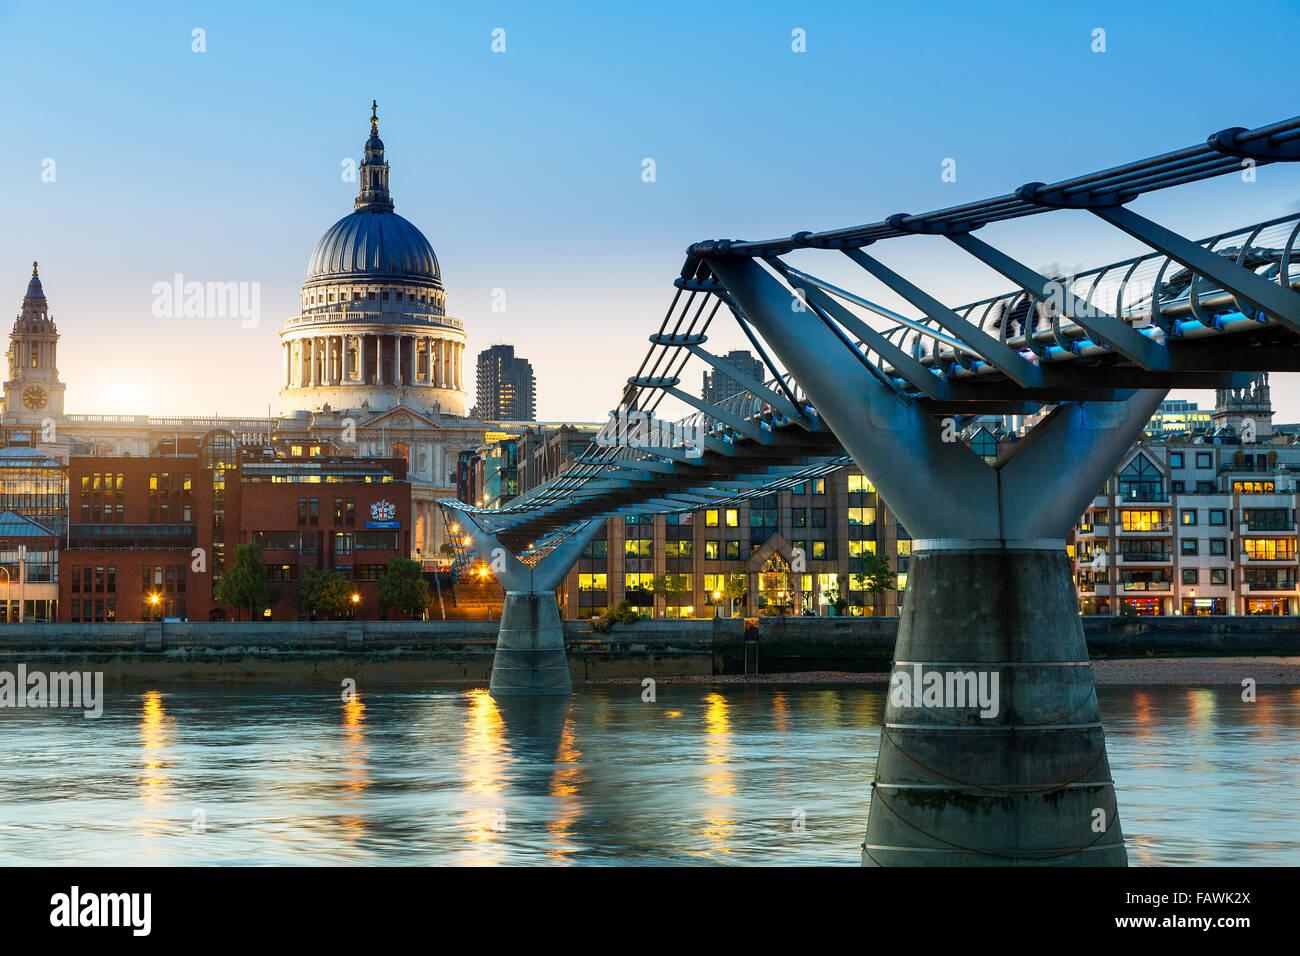 Londres, Millennium Bridge at Dusk Photo Stock